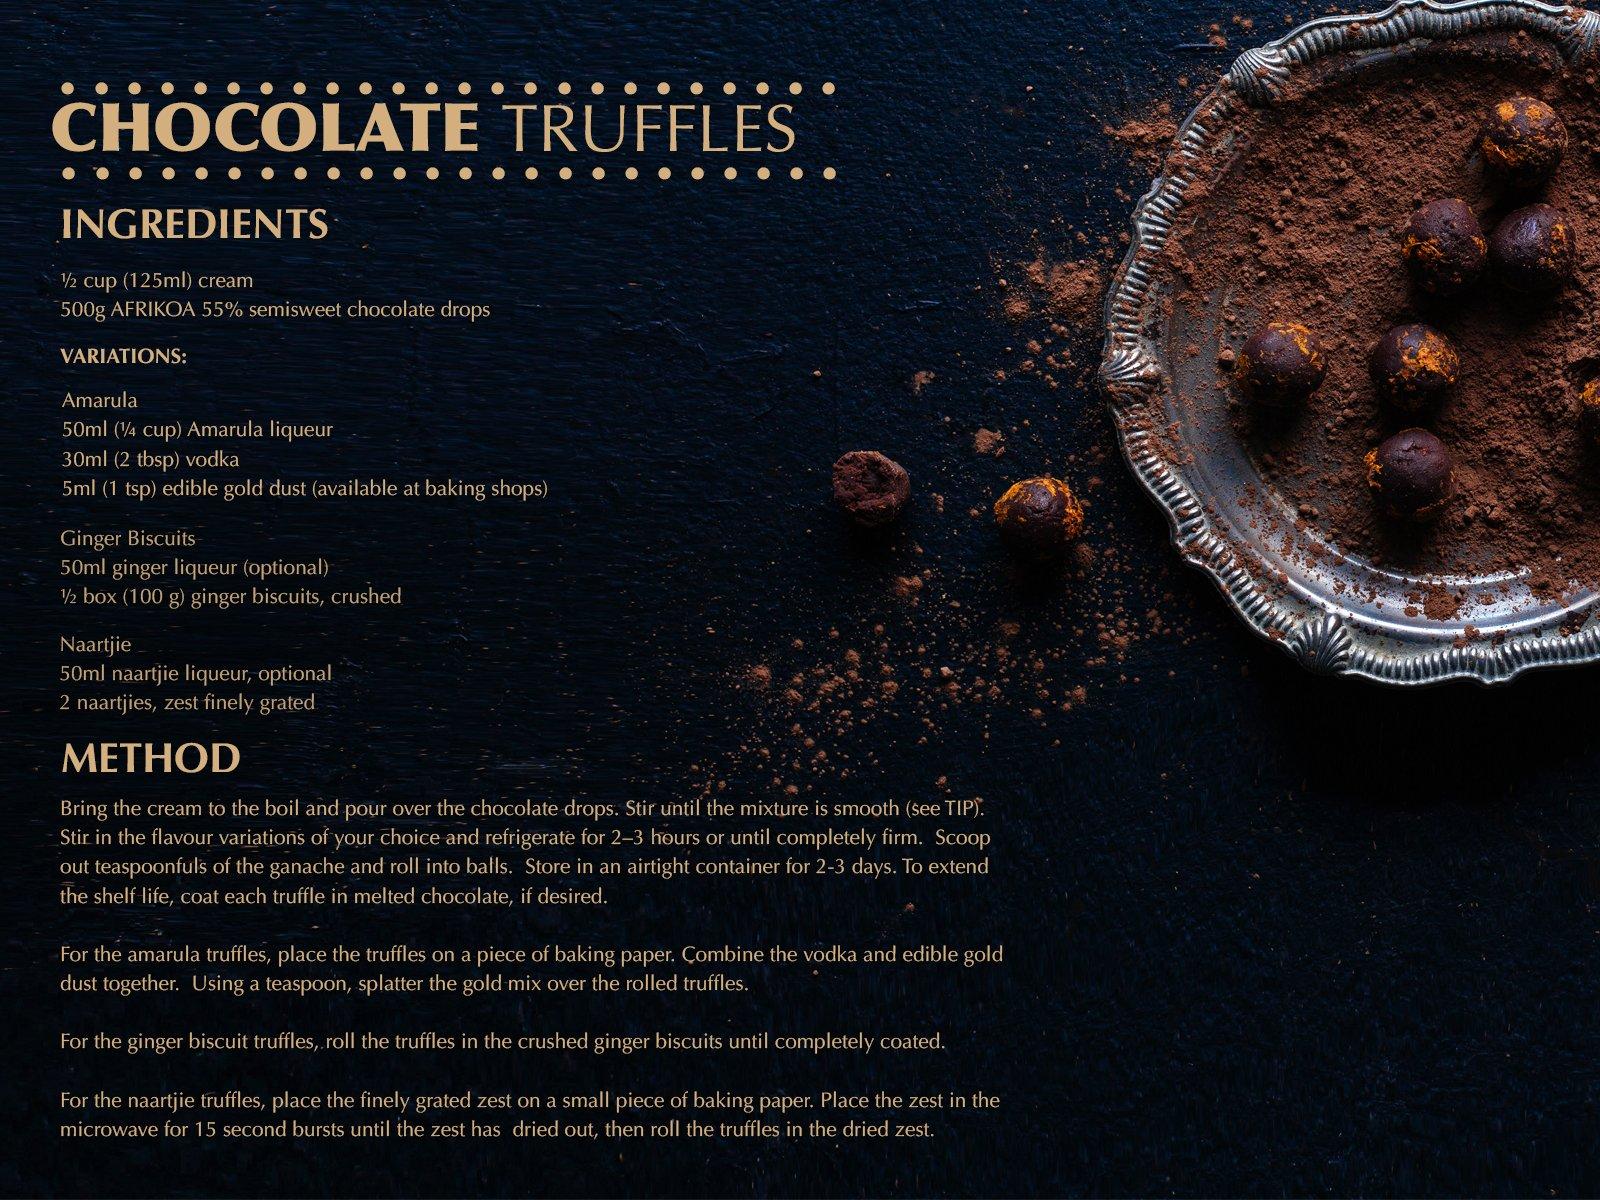 Afrikoa Chocolate truffle recipe sonia cabano blog eatdrinkcapetown food wine travel